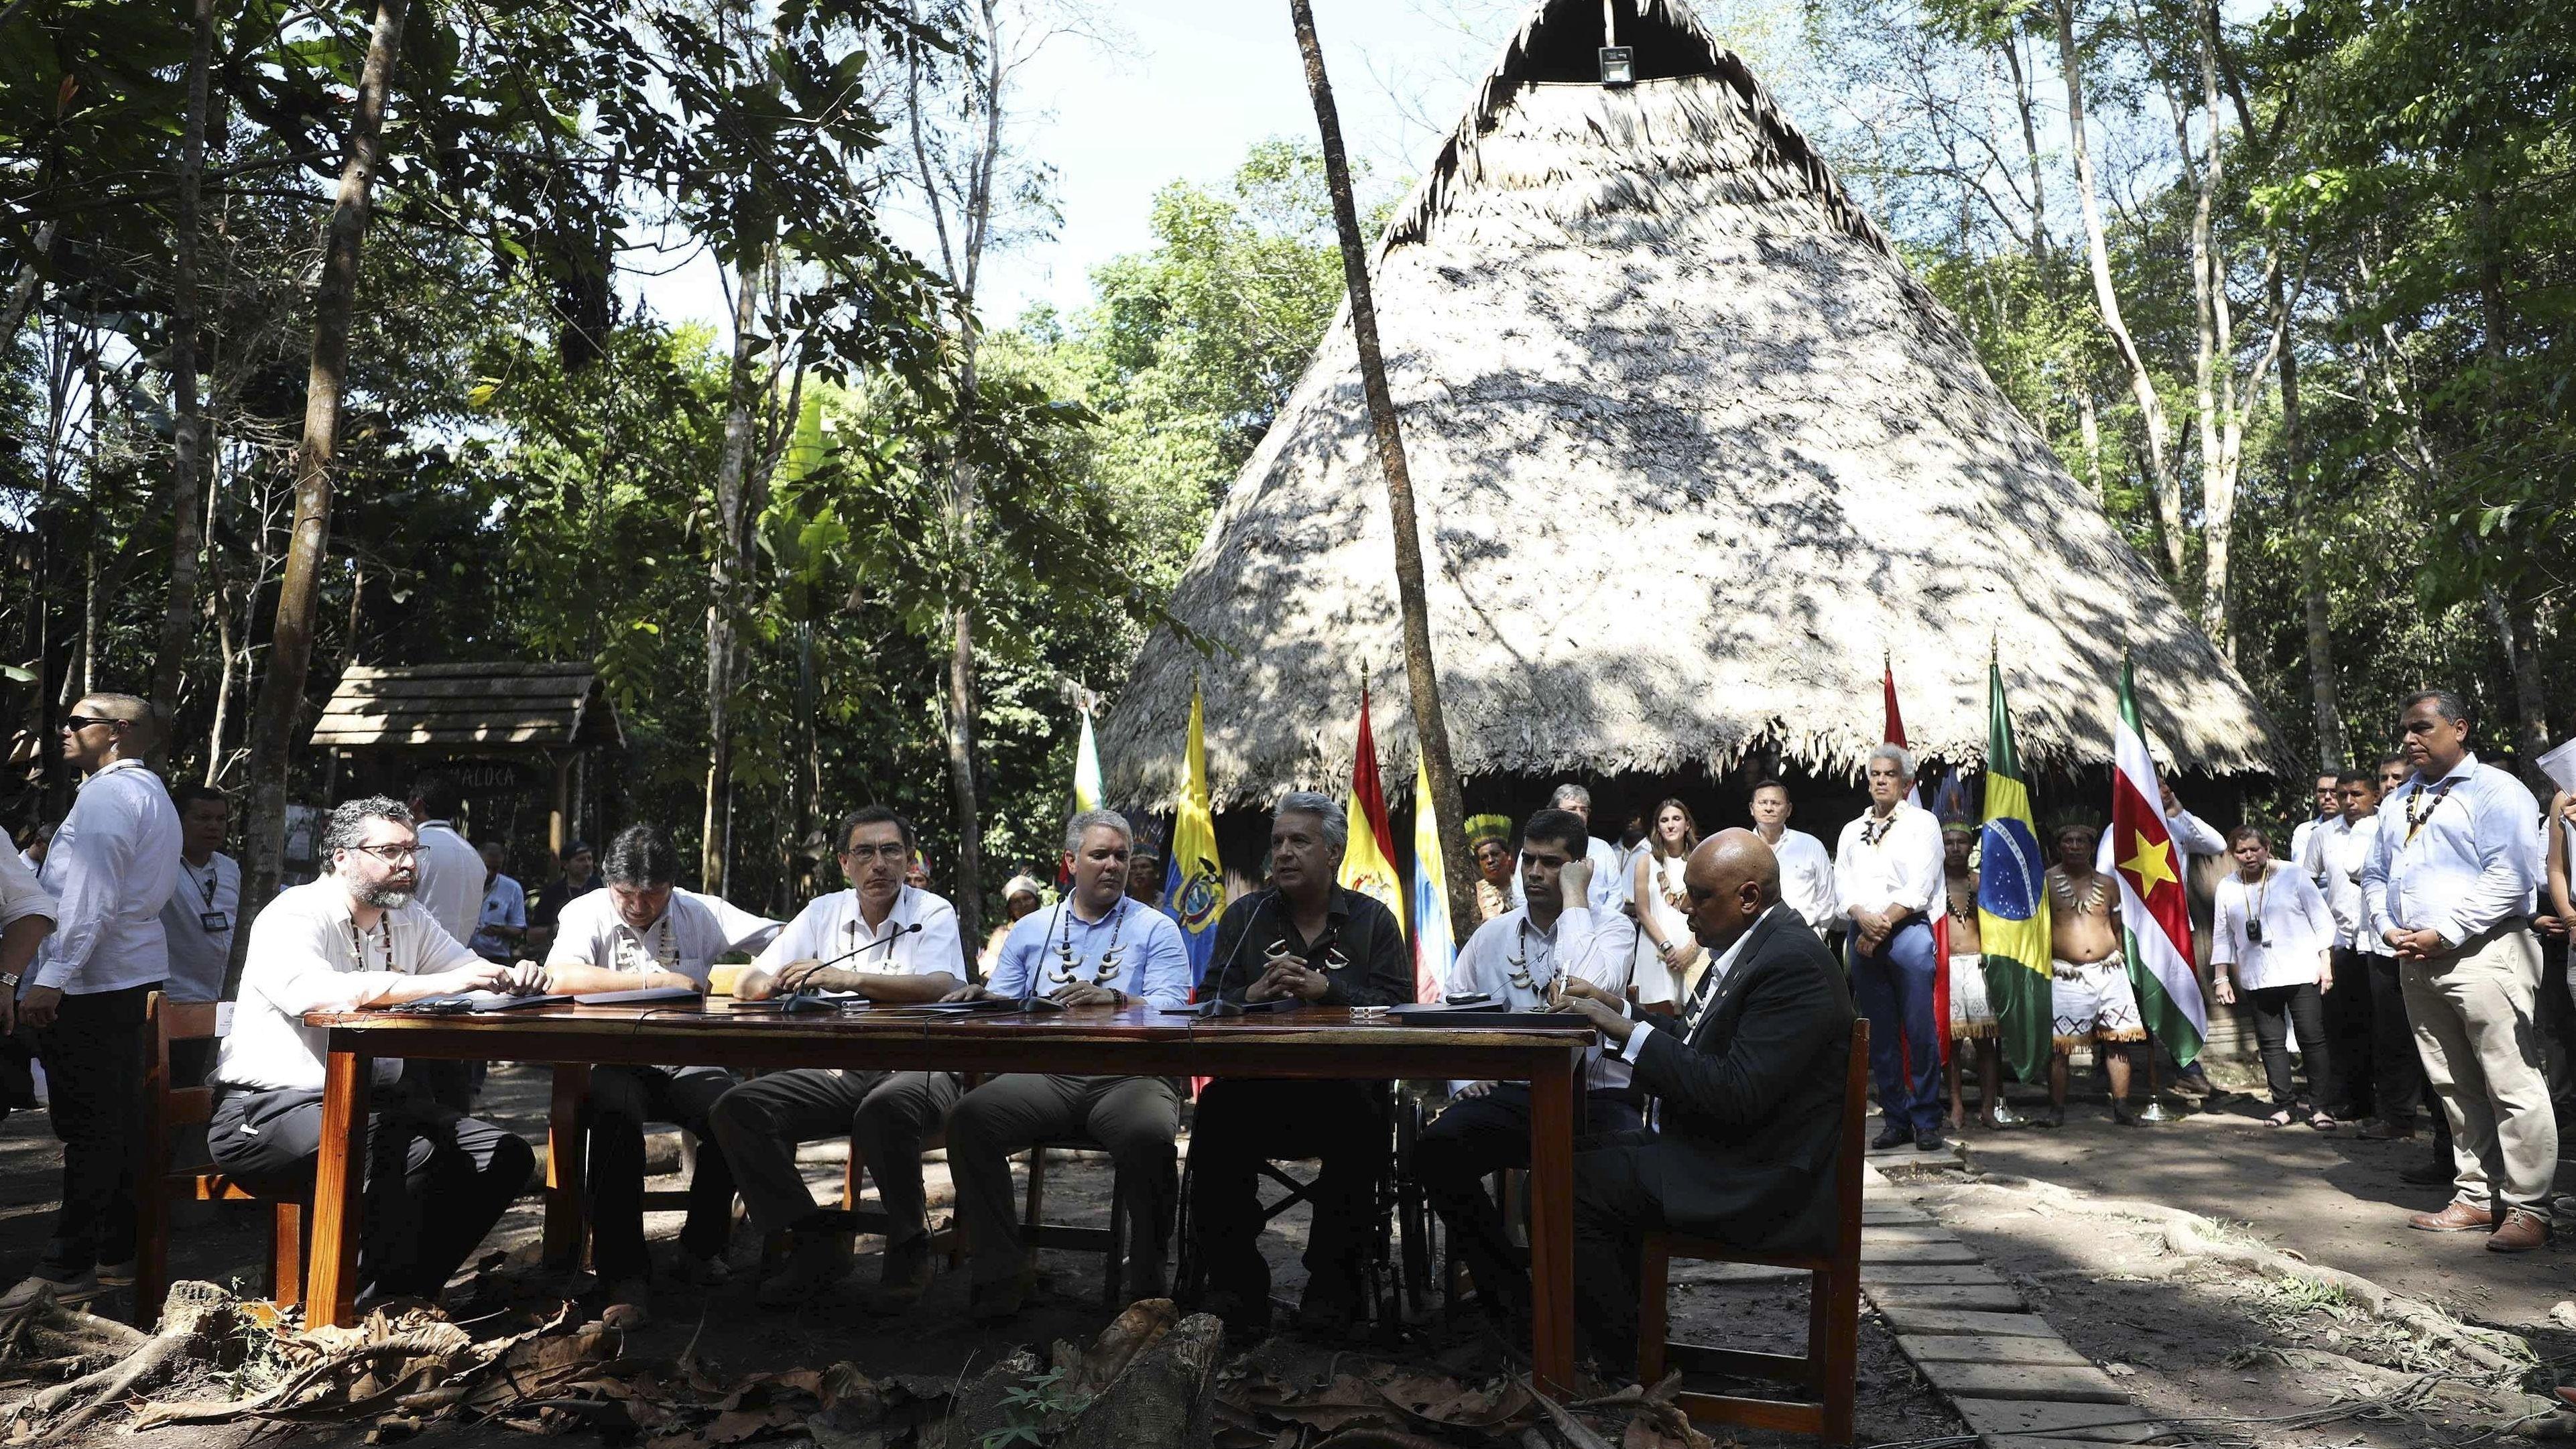 Amazonas-Gipfeltreffen